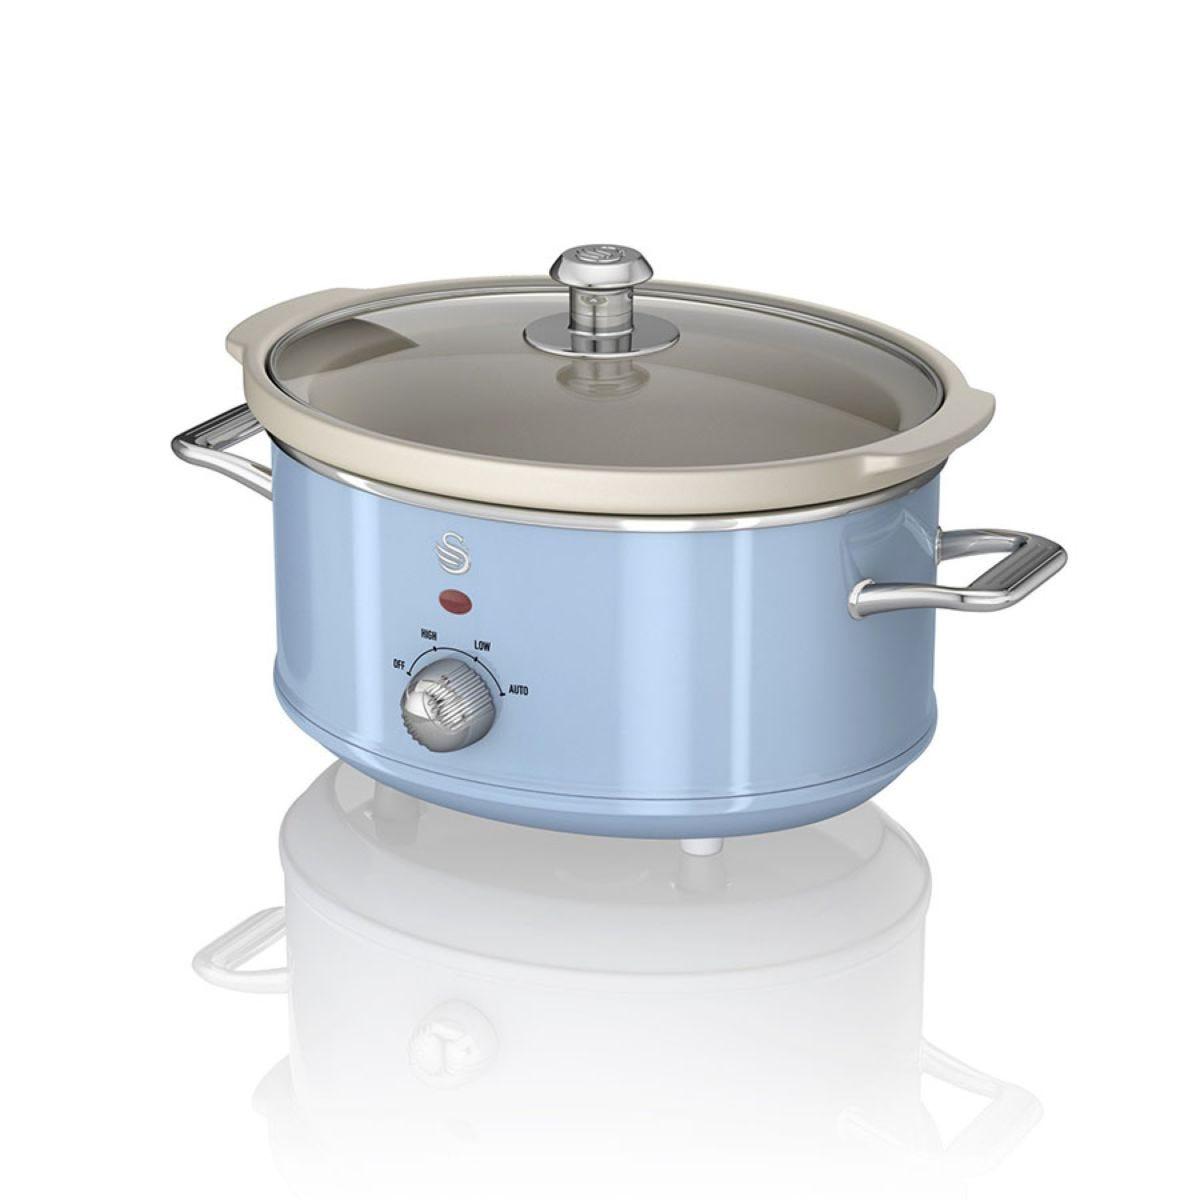 Swan SF17021BLN 3.5L Retro Slow Cooker - Blue